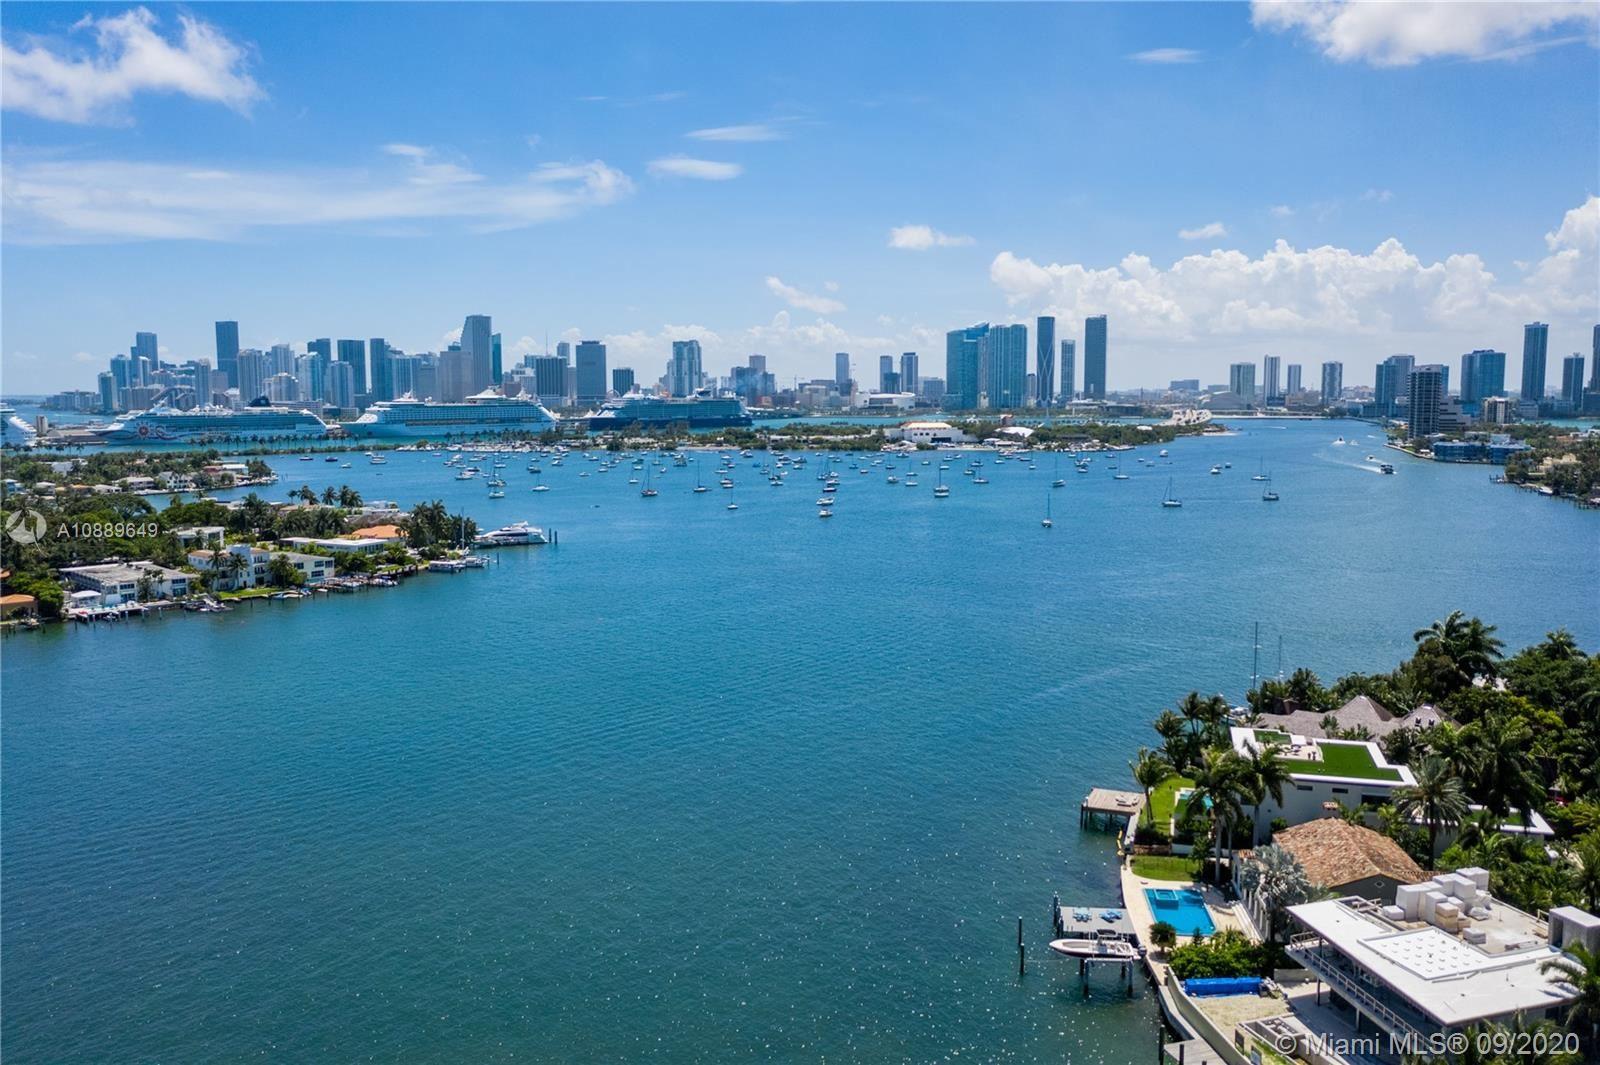 Photo 68 of Listing MLS a10889649 in 10 W San Marino Dr Miami Beach FL 33139